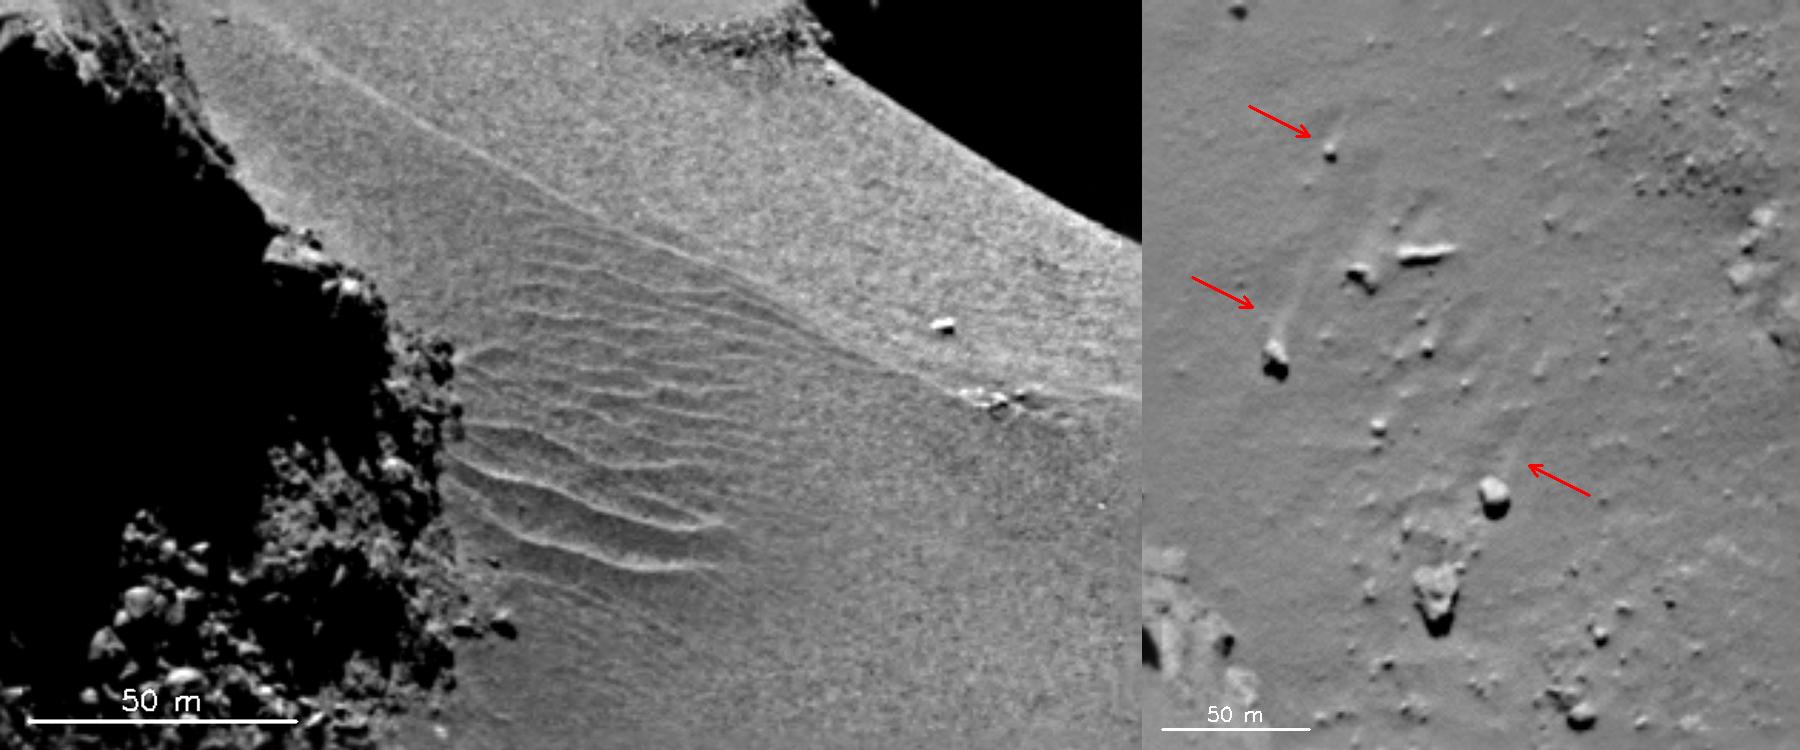 1567215770353-ESA_Rosetta_67P_OSIRIS_NAC_ripples_and_wind-tails.jpg